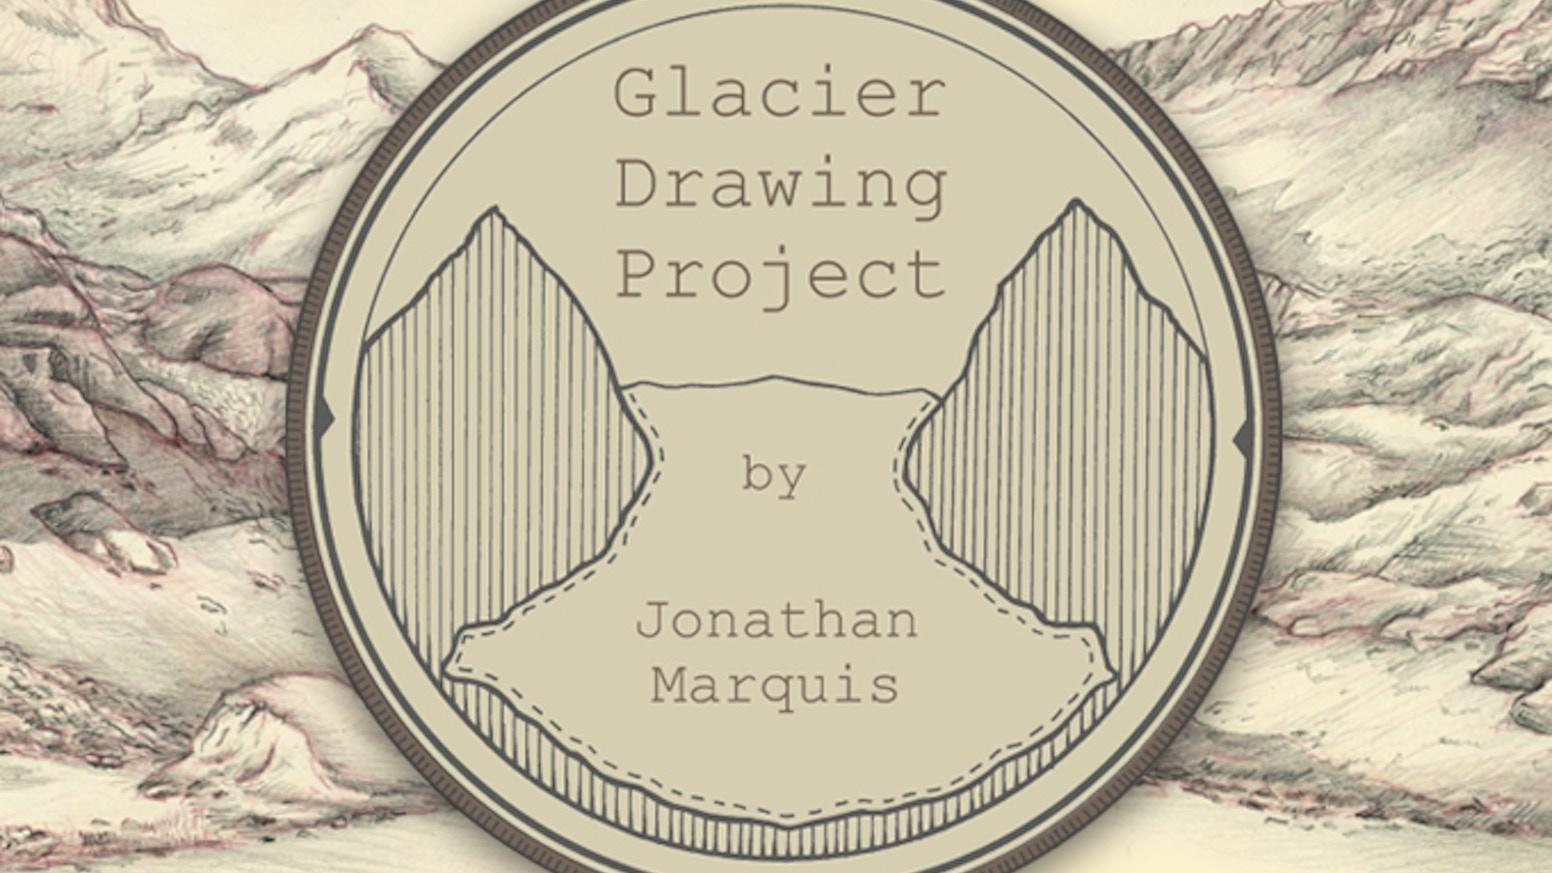 Glacier Drawing Project by Jonathan Marquis — Kickstarter